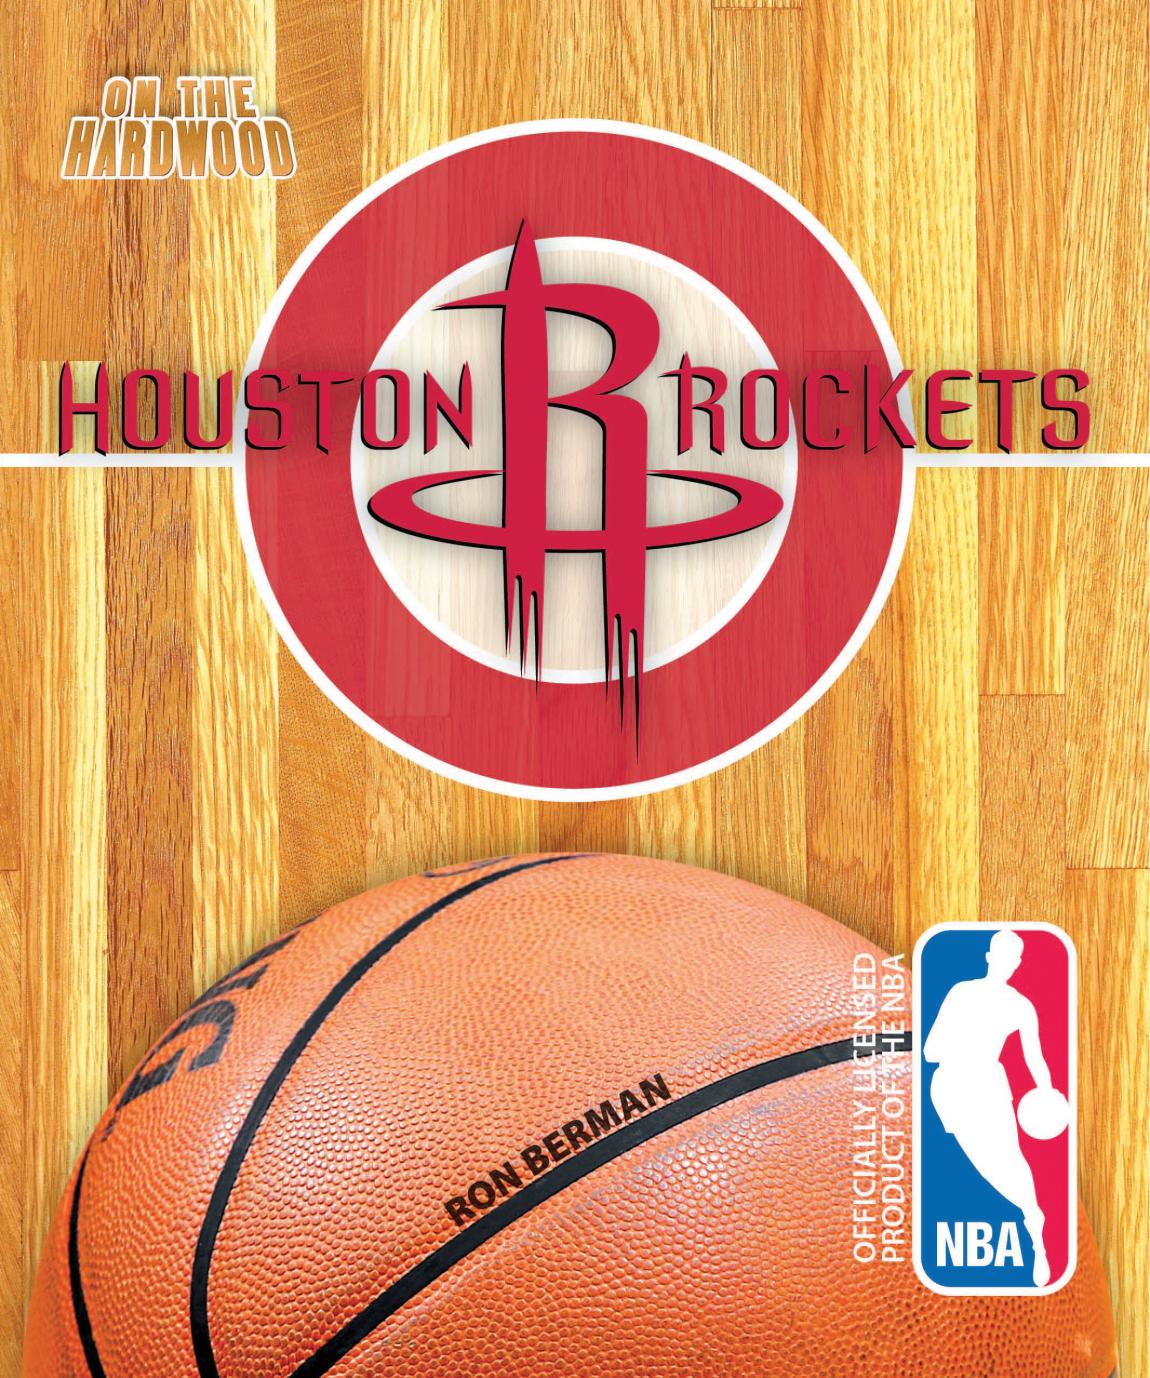 Rockets-1.png